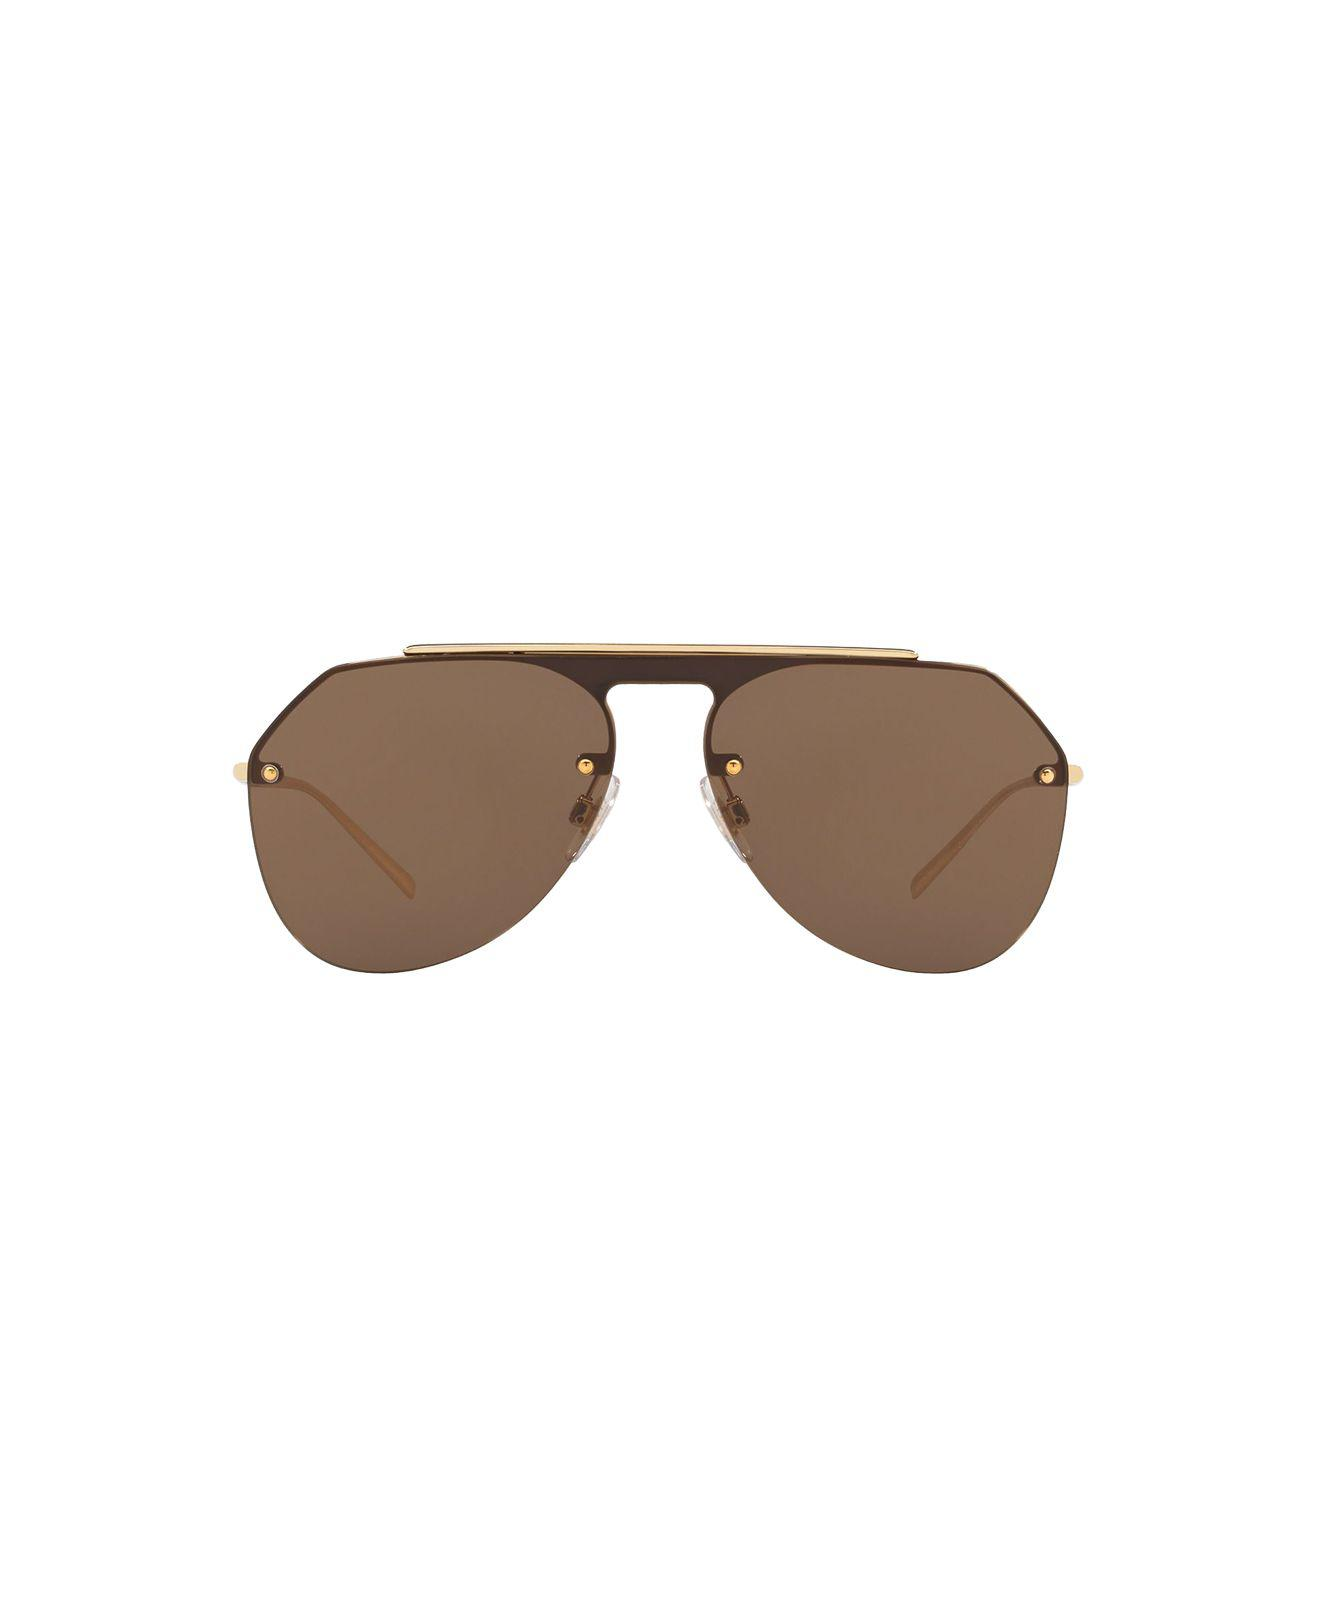 ba323e9f59e Lyst - Dolce   Gabbana Sunglasses